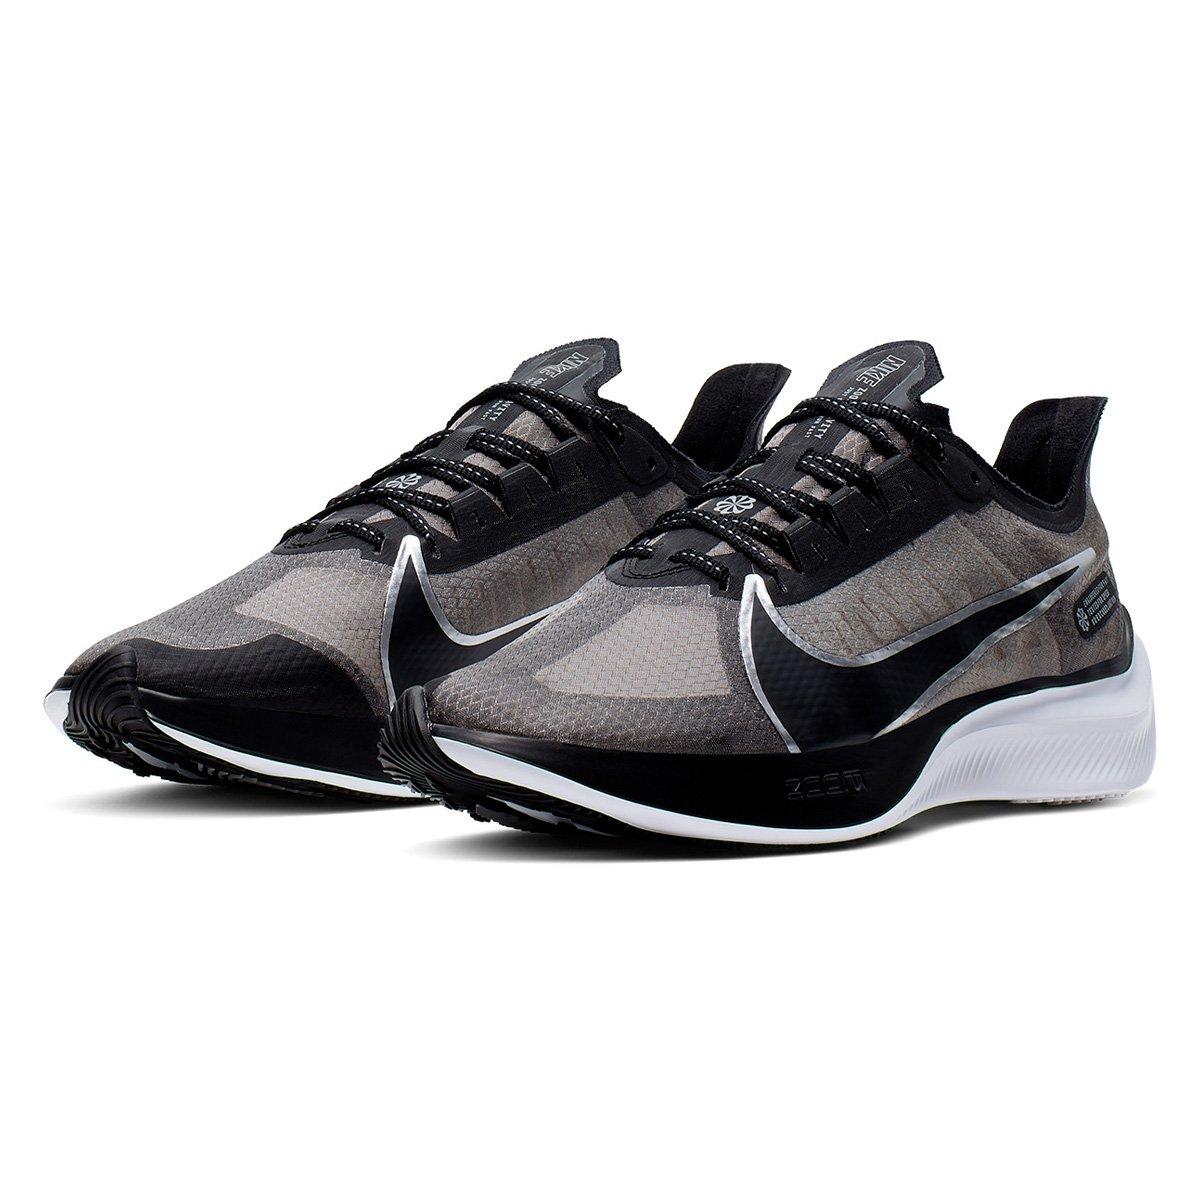 Tênis Nike Zoom Gravity Masculino - Tam: 41